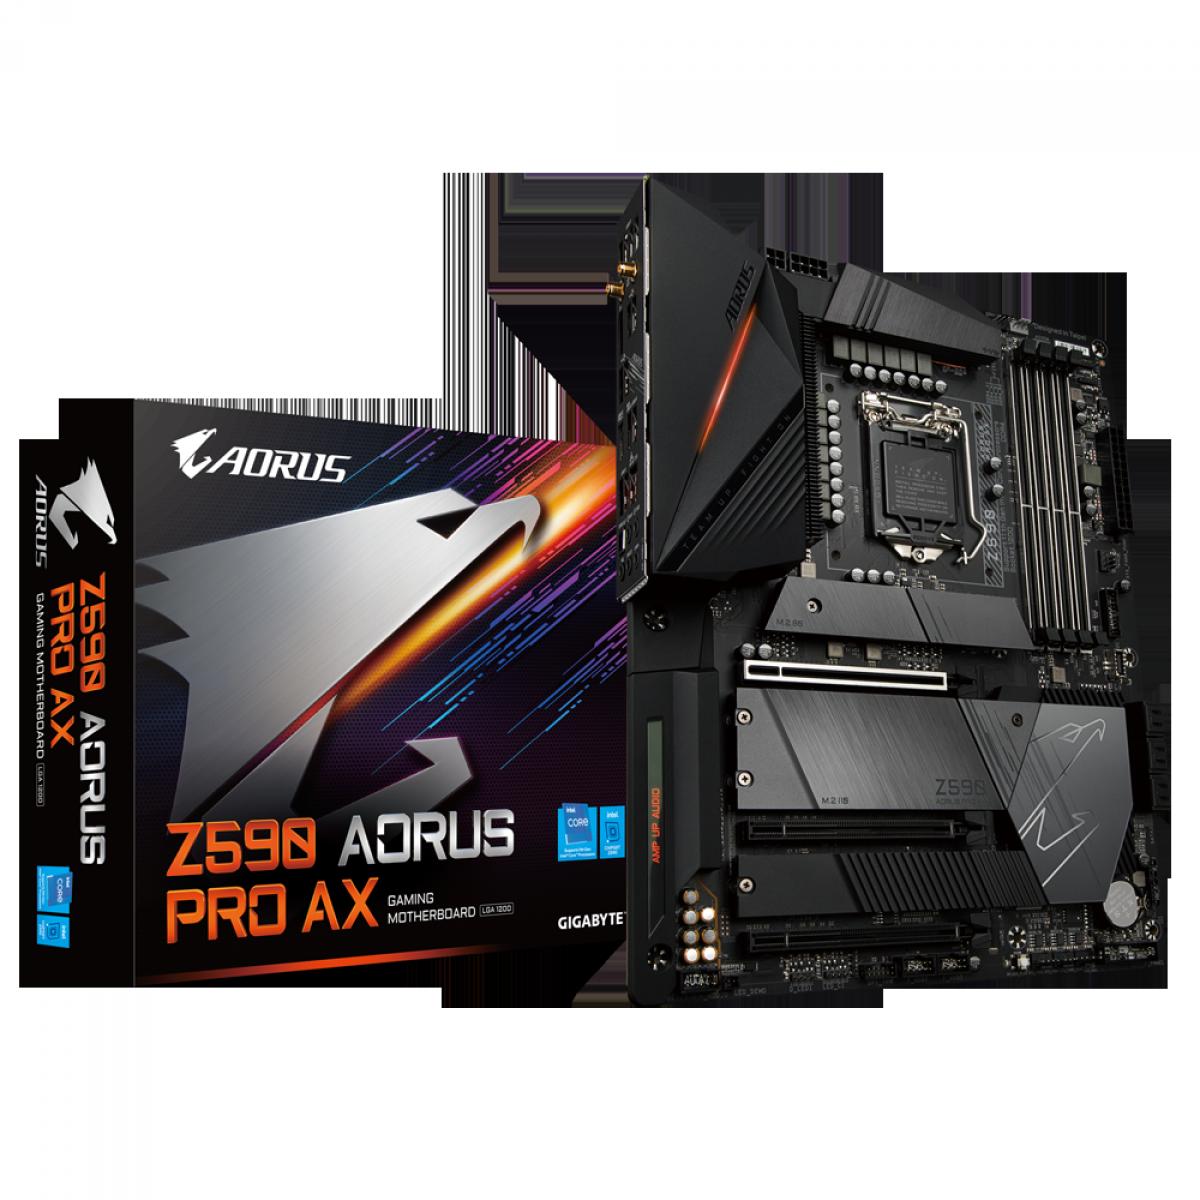 Placa Mãe GIGABYTE Z590 AORUS PRO AX (rev. 1.0), Intel Z590 Express Chipset, Socket 1200, ATX, DDR4